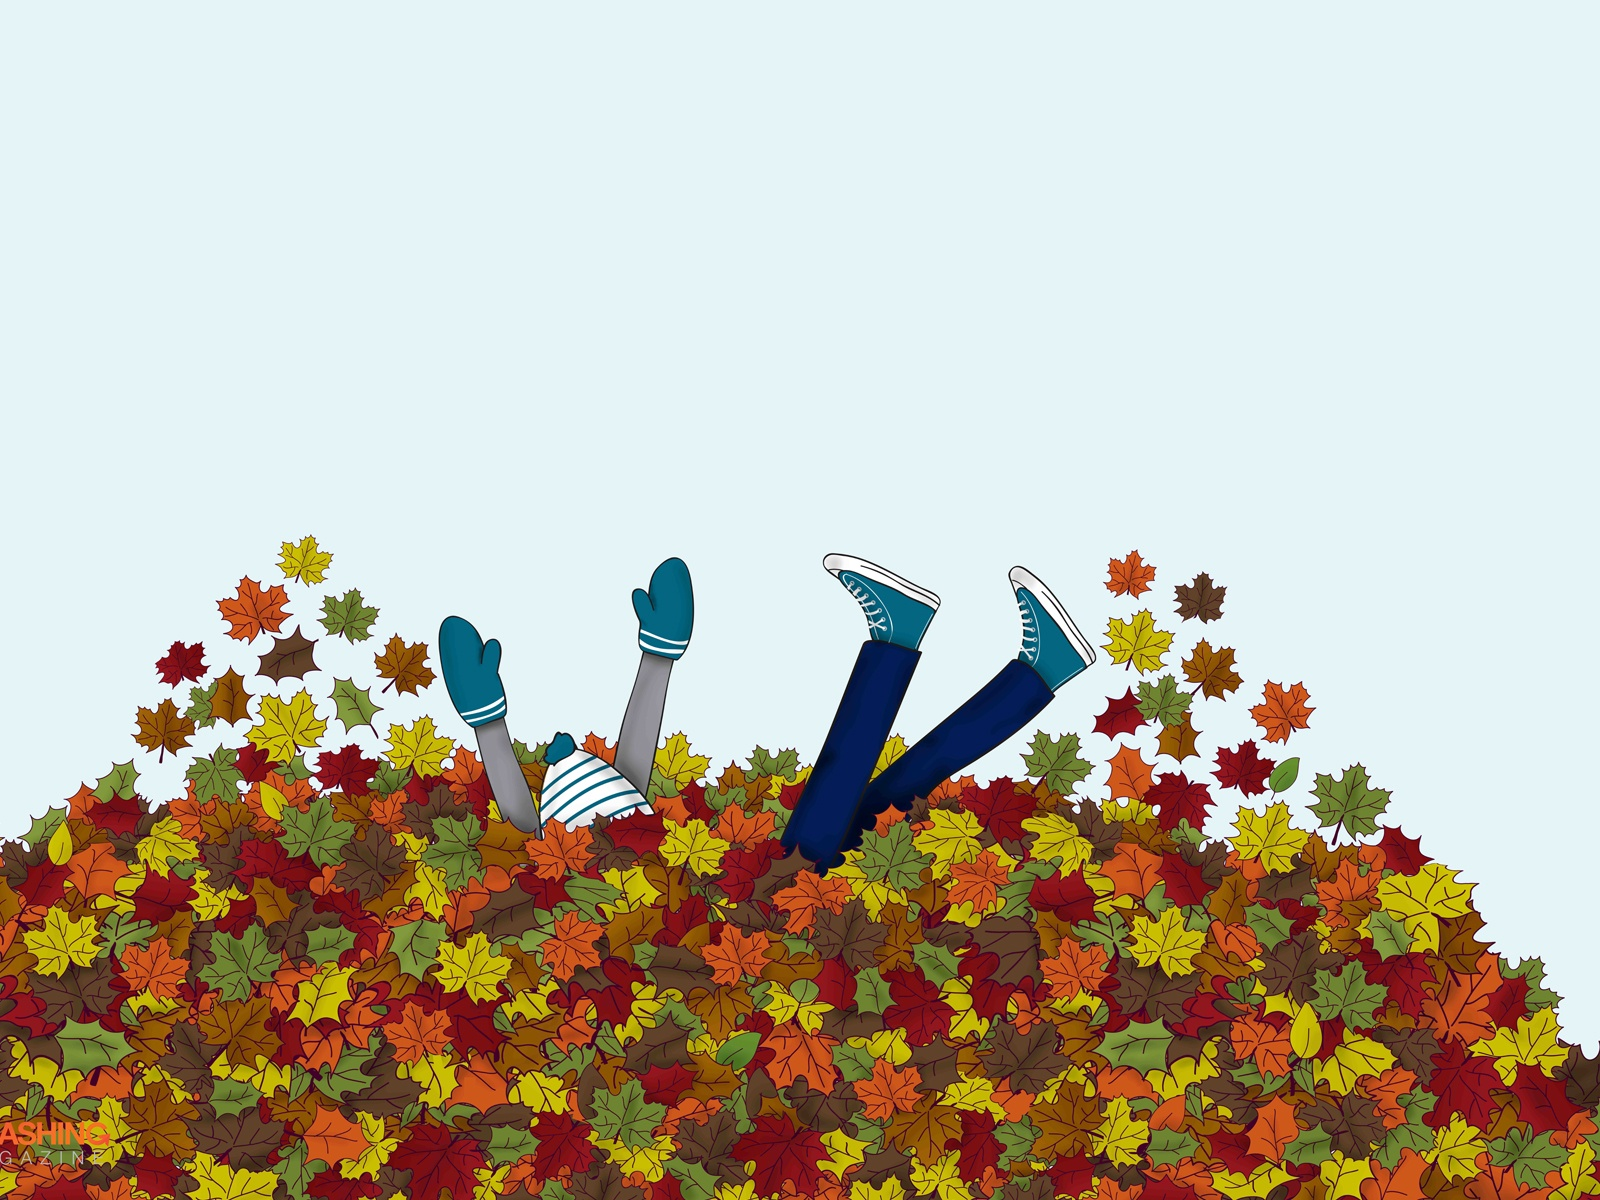 Cute Fall Wallpaper   HD Wallpapers Lovely 1600x1200